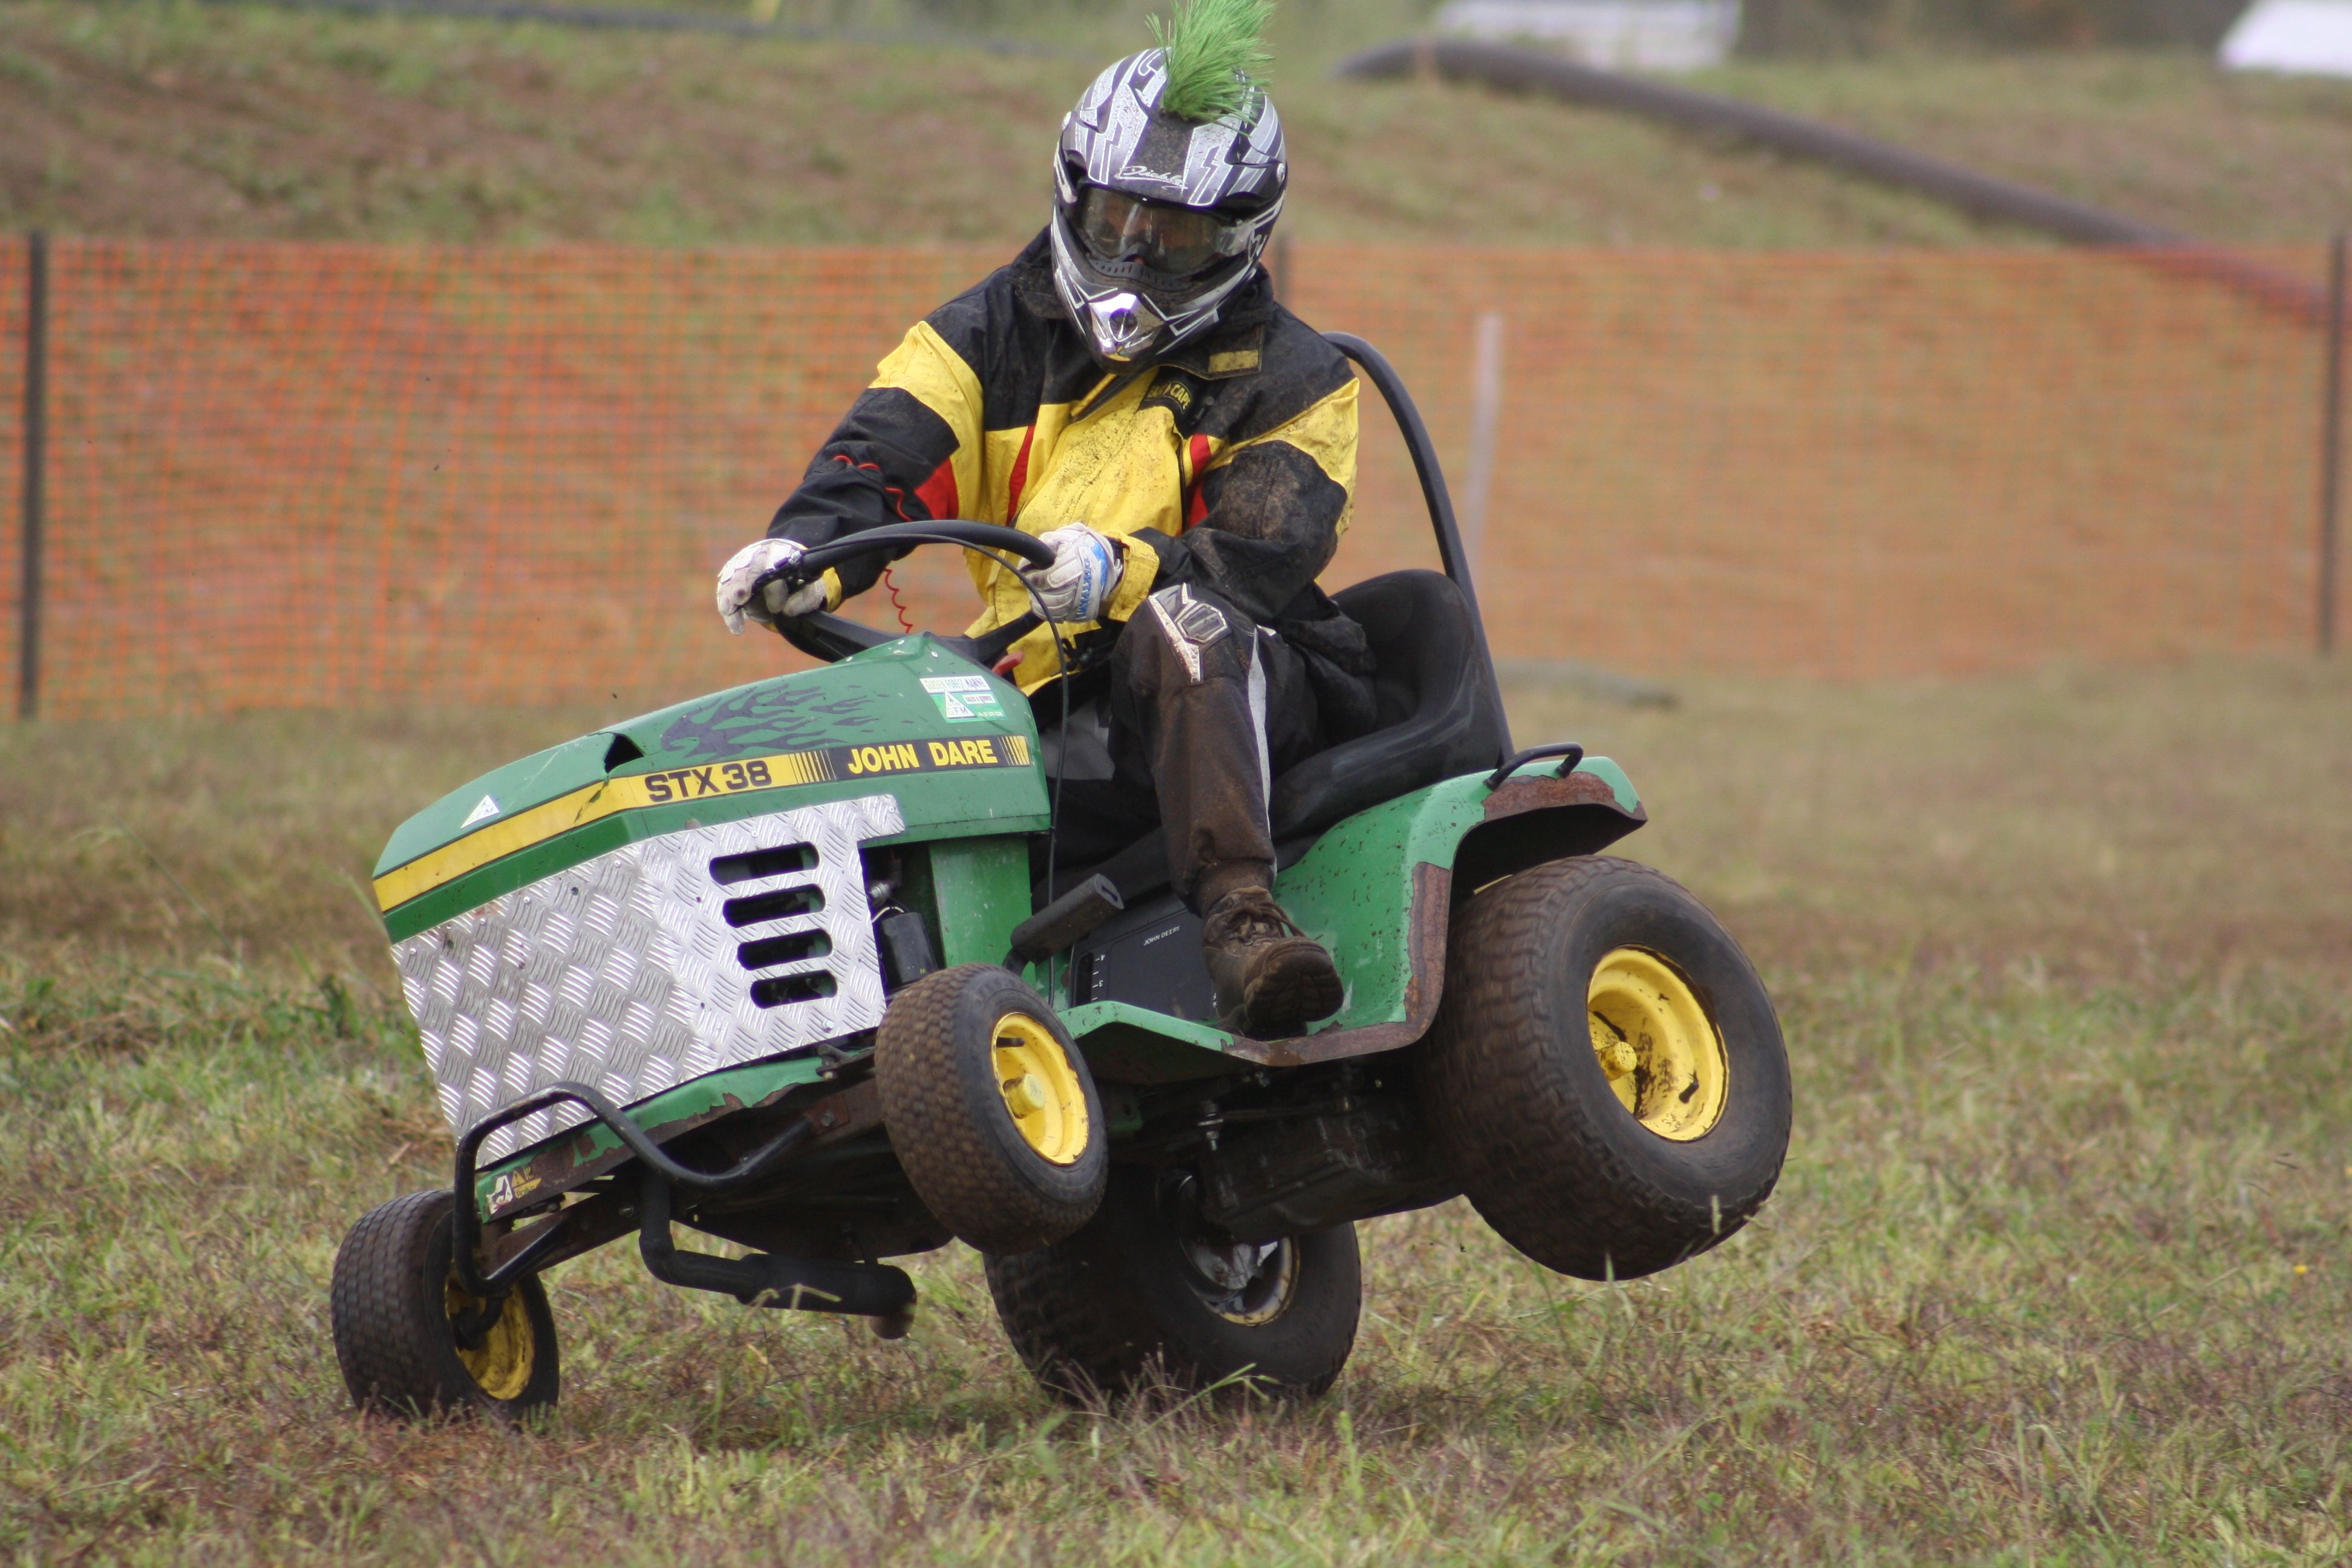 Lawn Mower Racing >> Lawn Mower Racing At Whitianga Nz Lawn Mower Old